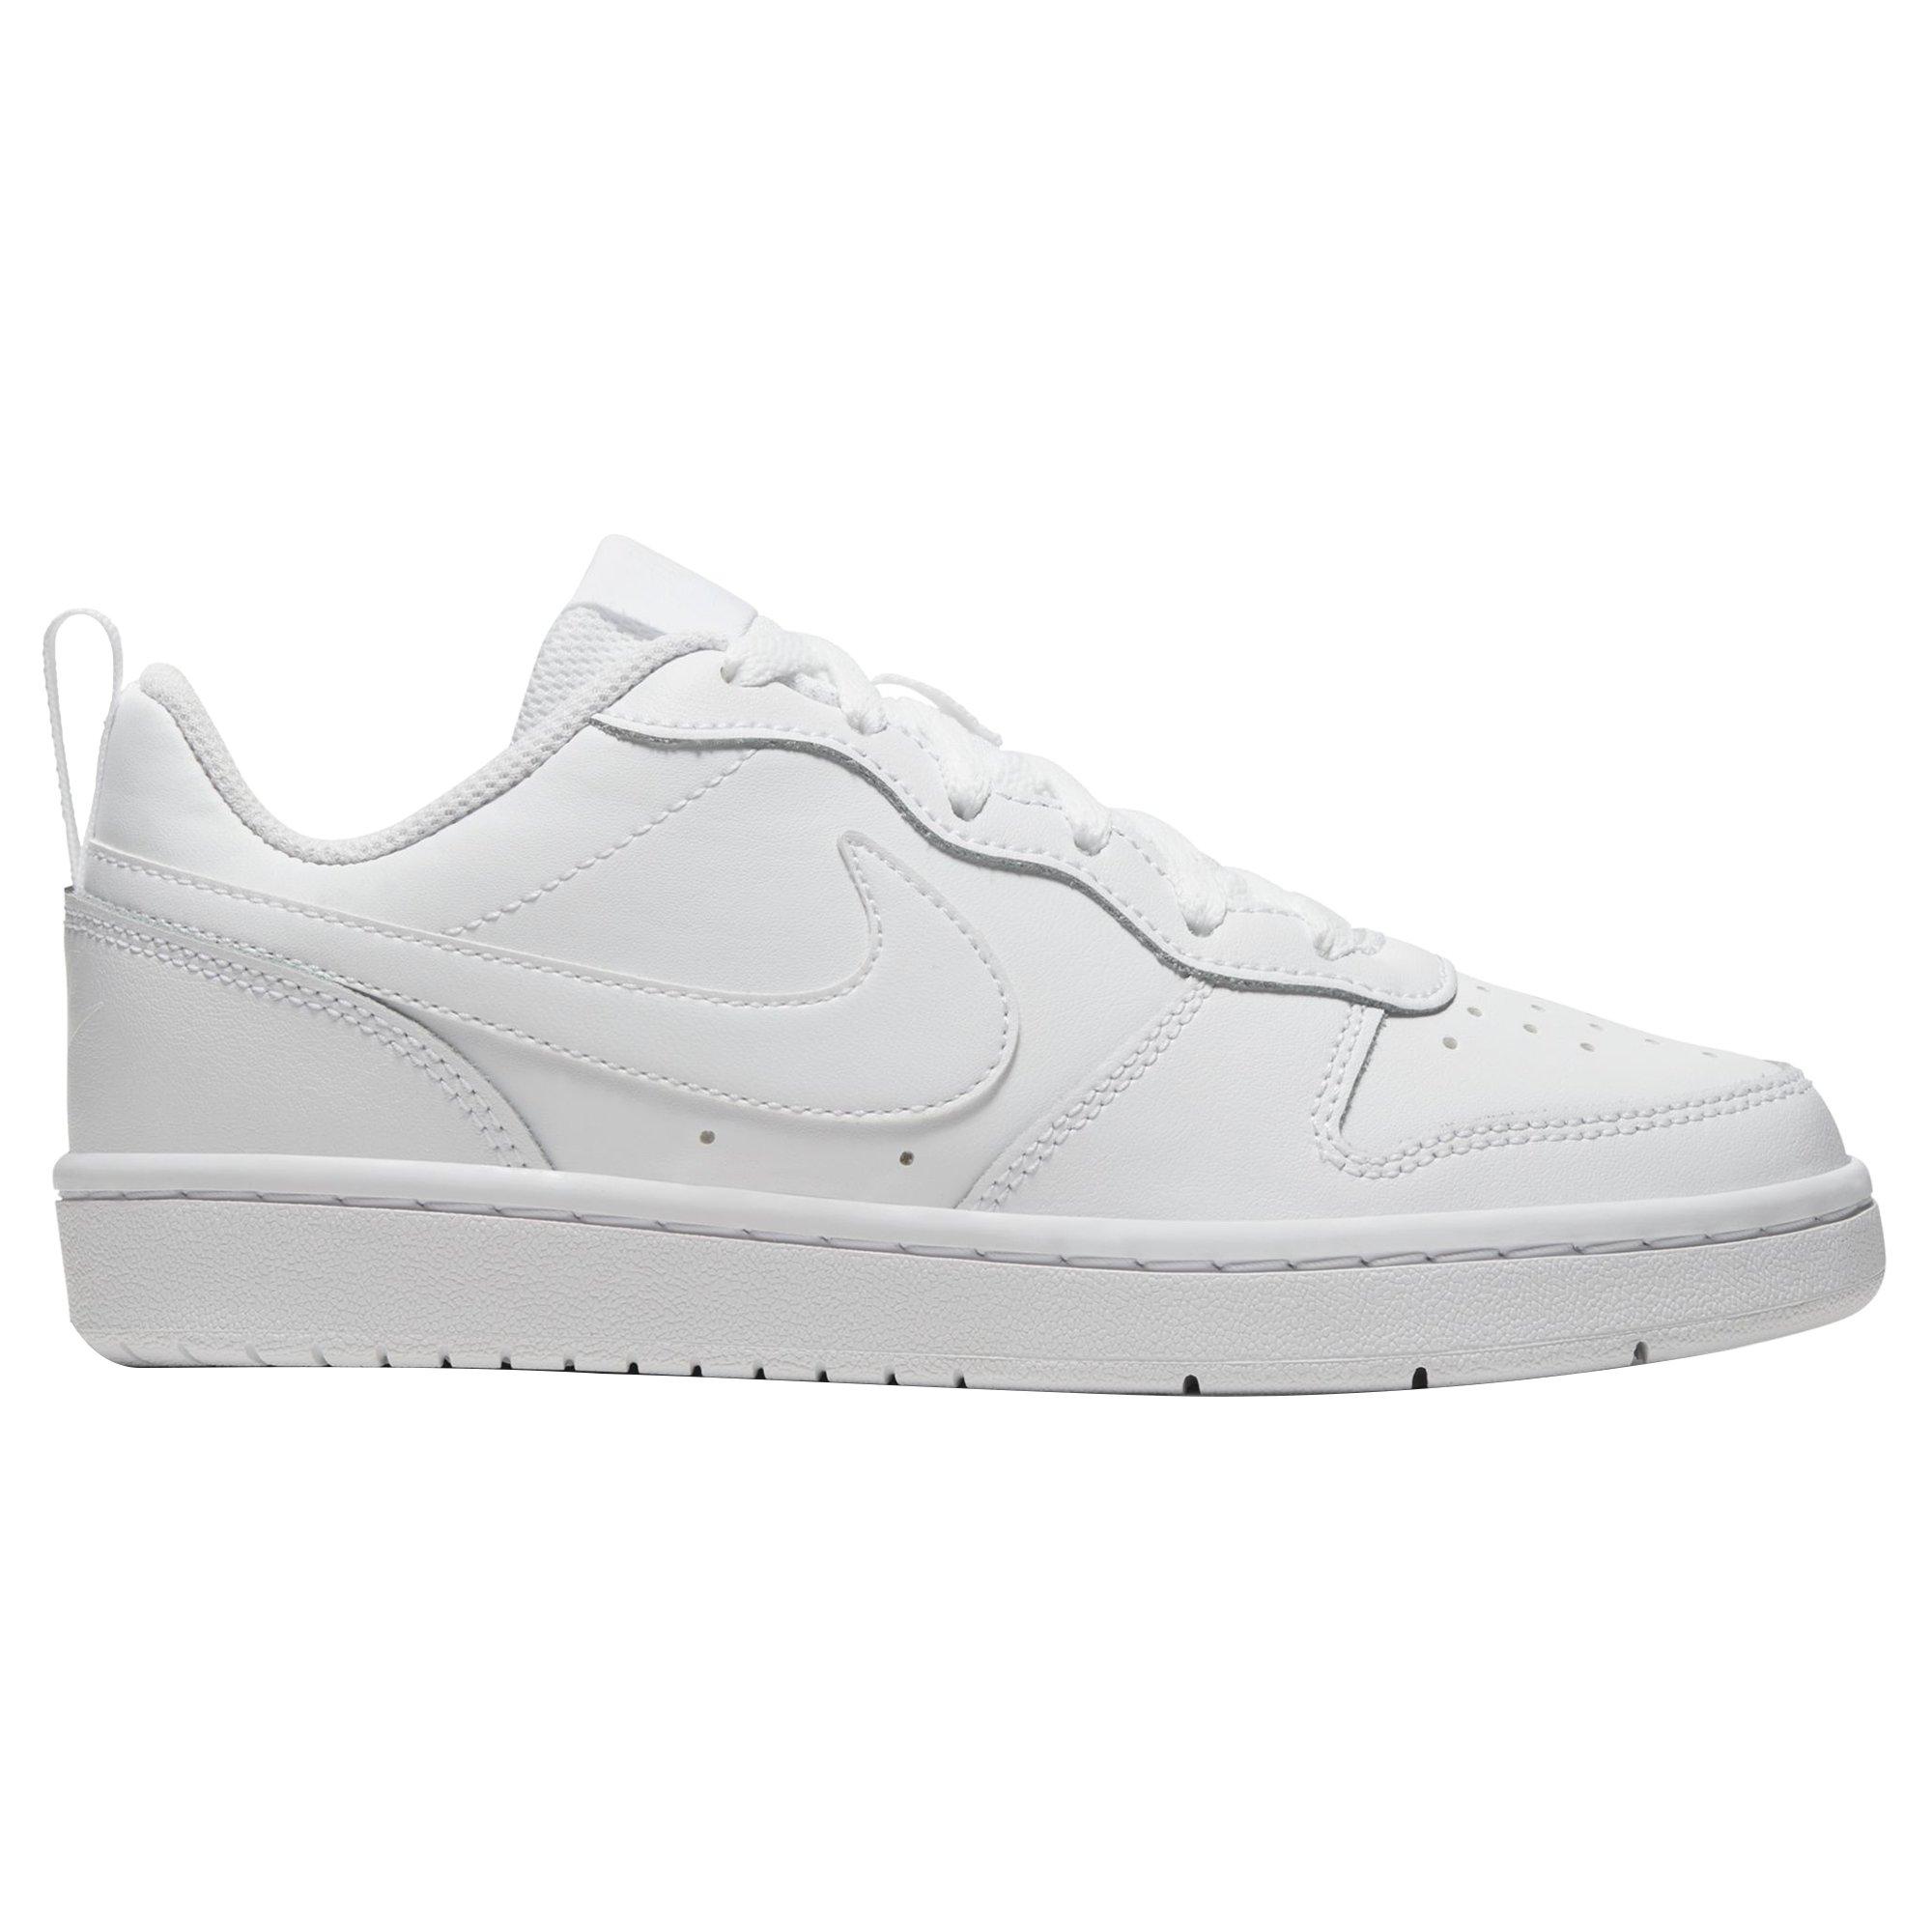 Nike Court Borough Low 2 (GS) Spor Ayakkabı BQ5448-100 - Barcin.com